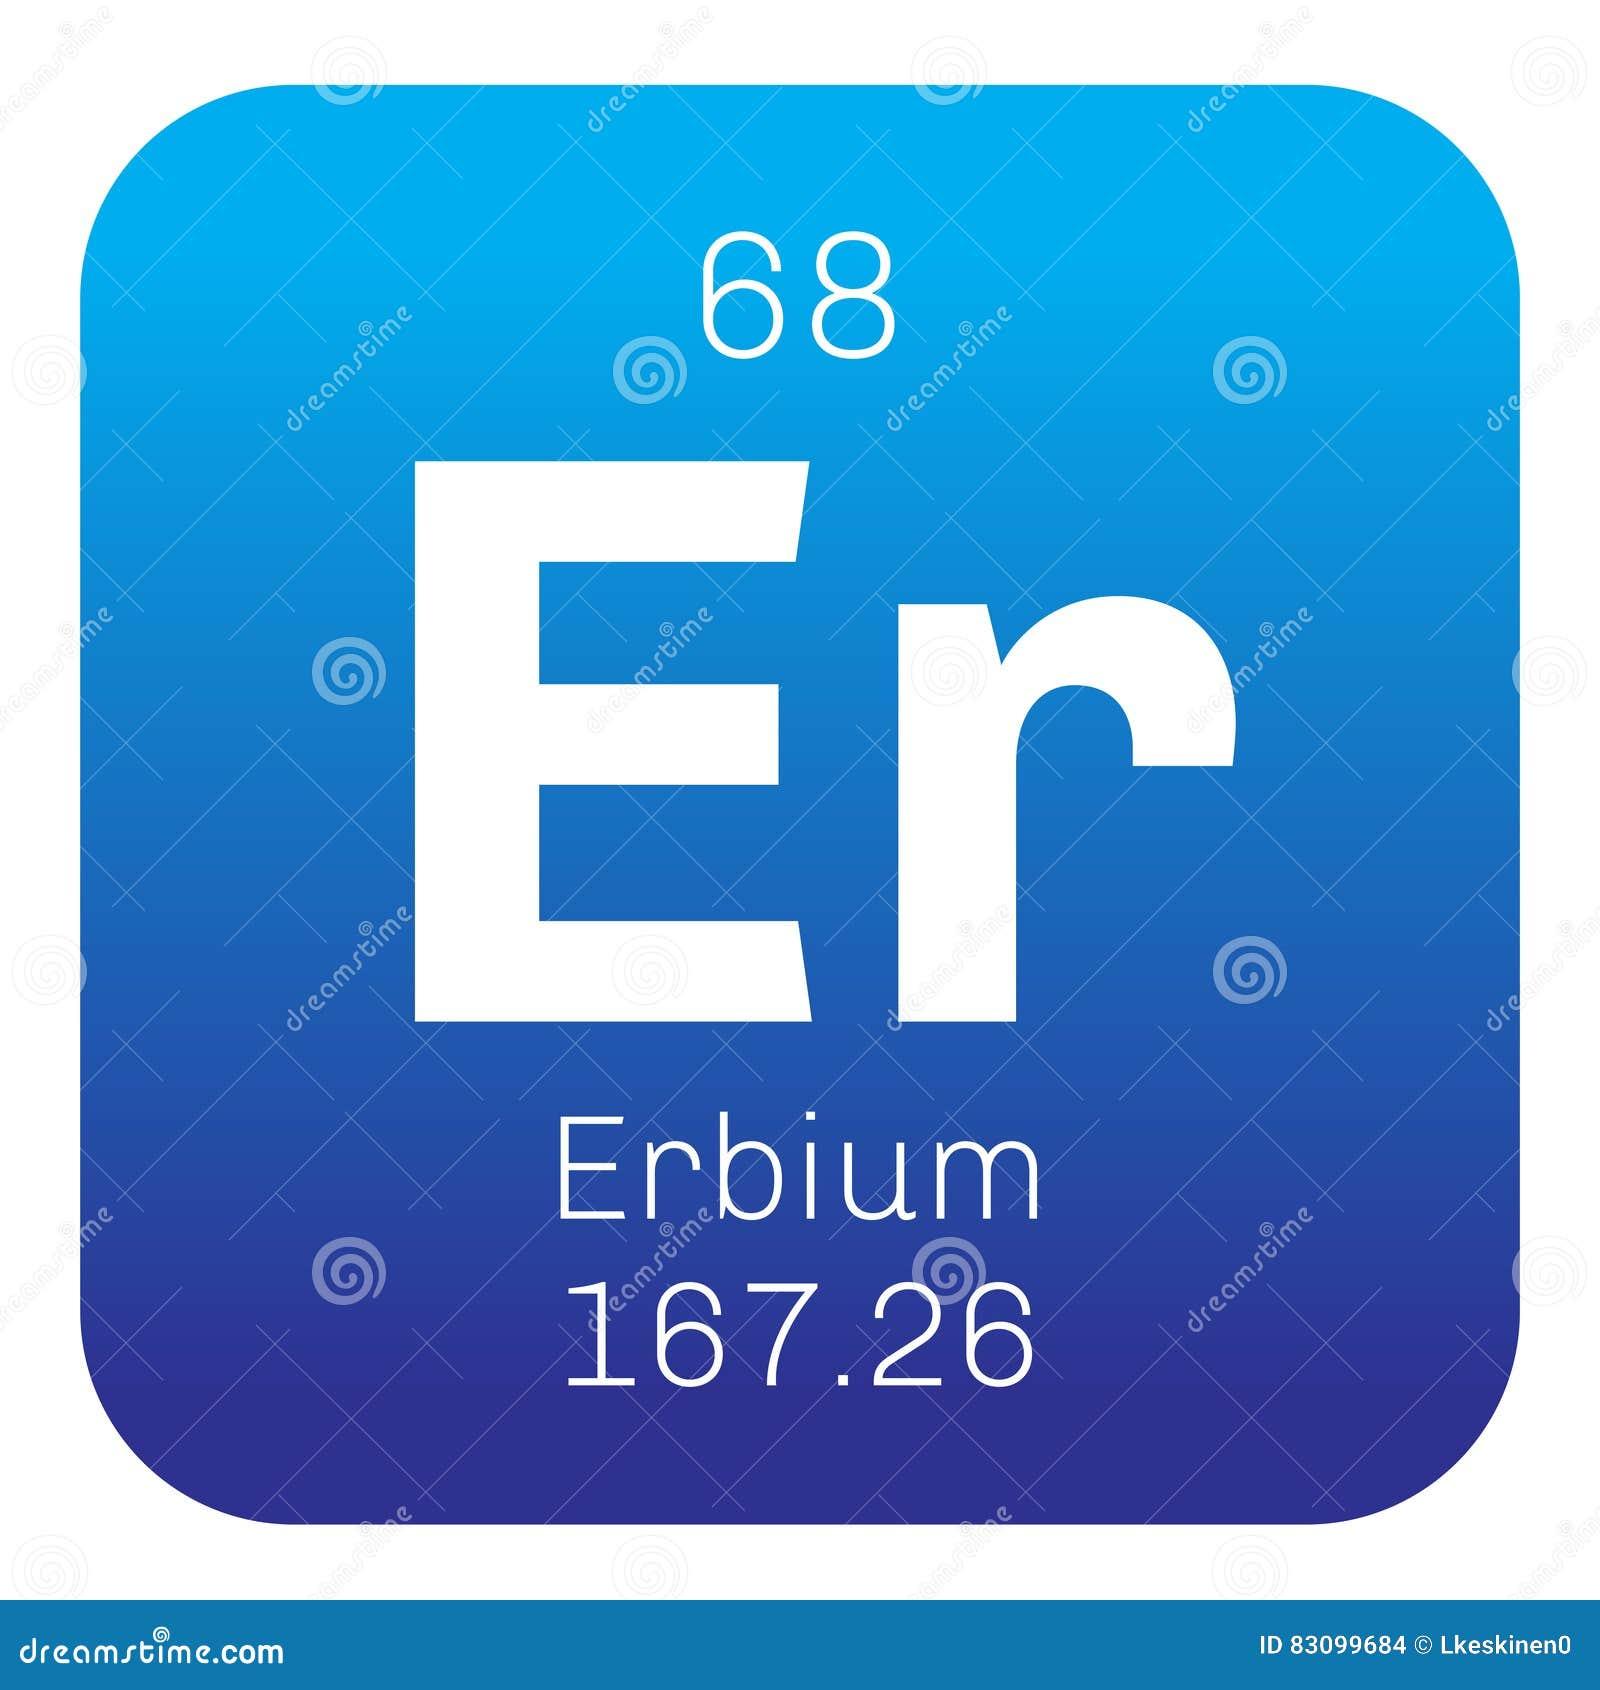 Periodic table element erbium icon stock illustration image erbium chemical element stock images gamestrikefo Image collections